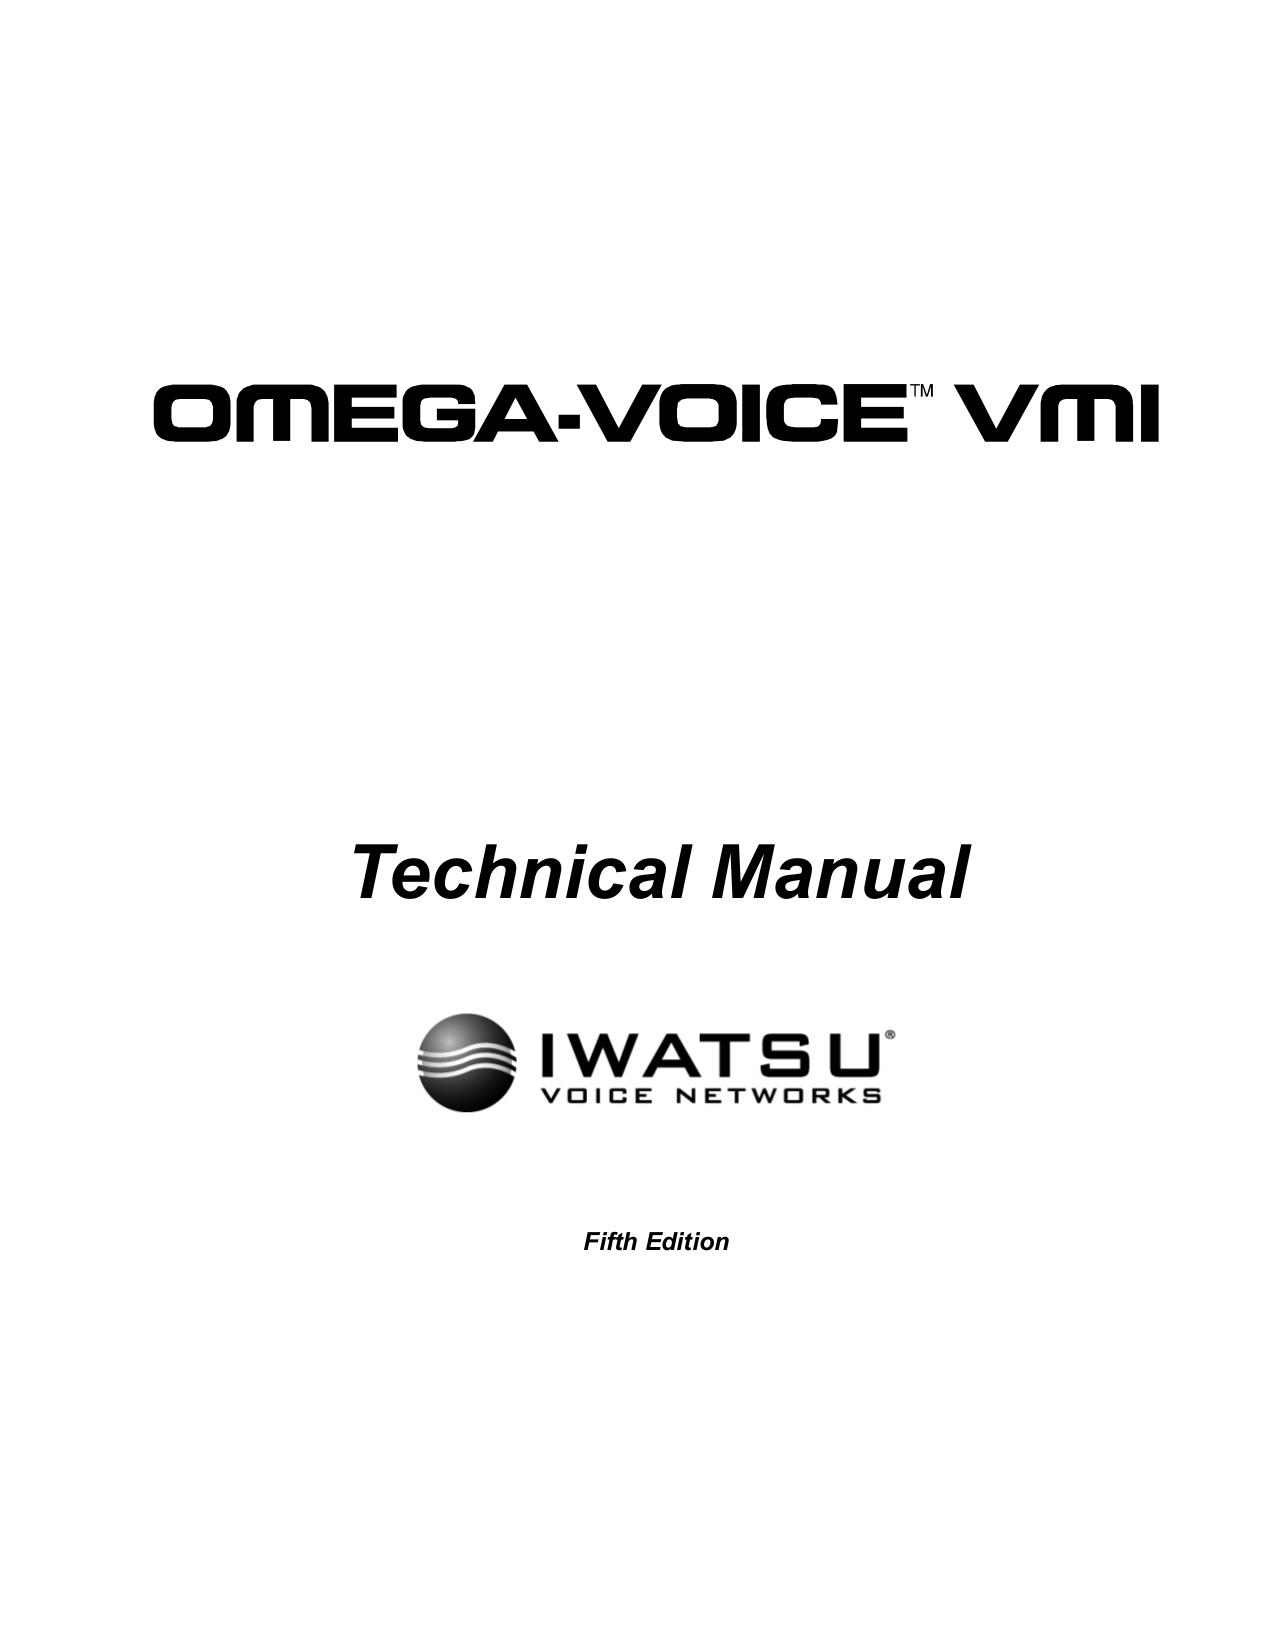 Download free pdf for Iwatsu ADIX Telephone manual